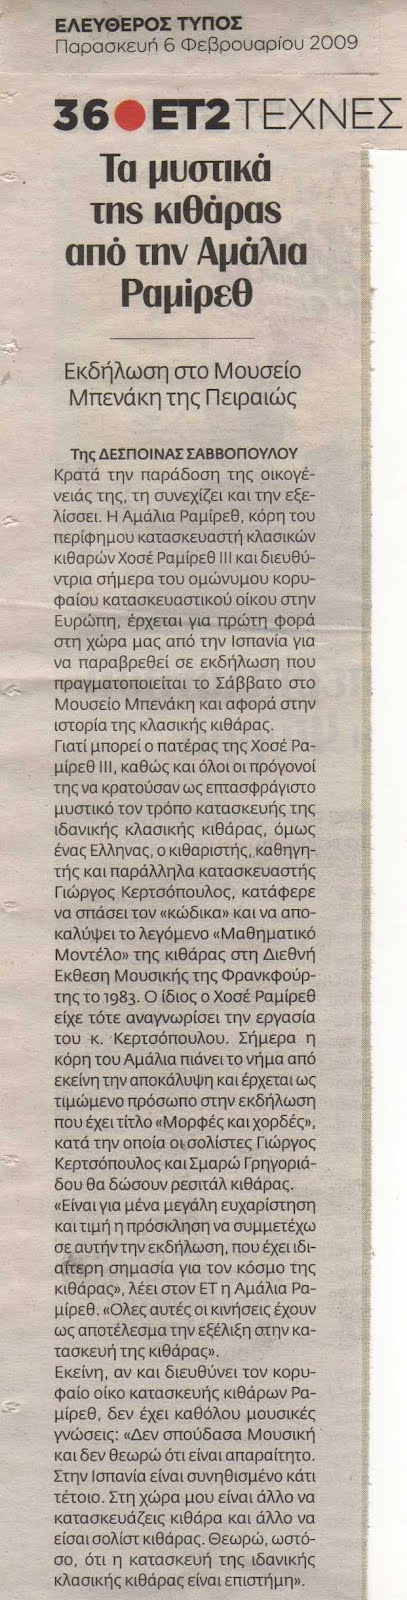 Eleftheros typos 2009-Amalia Ramirez in Athens